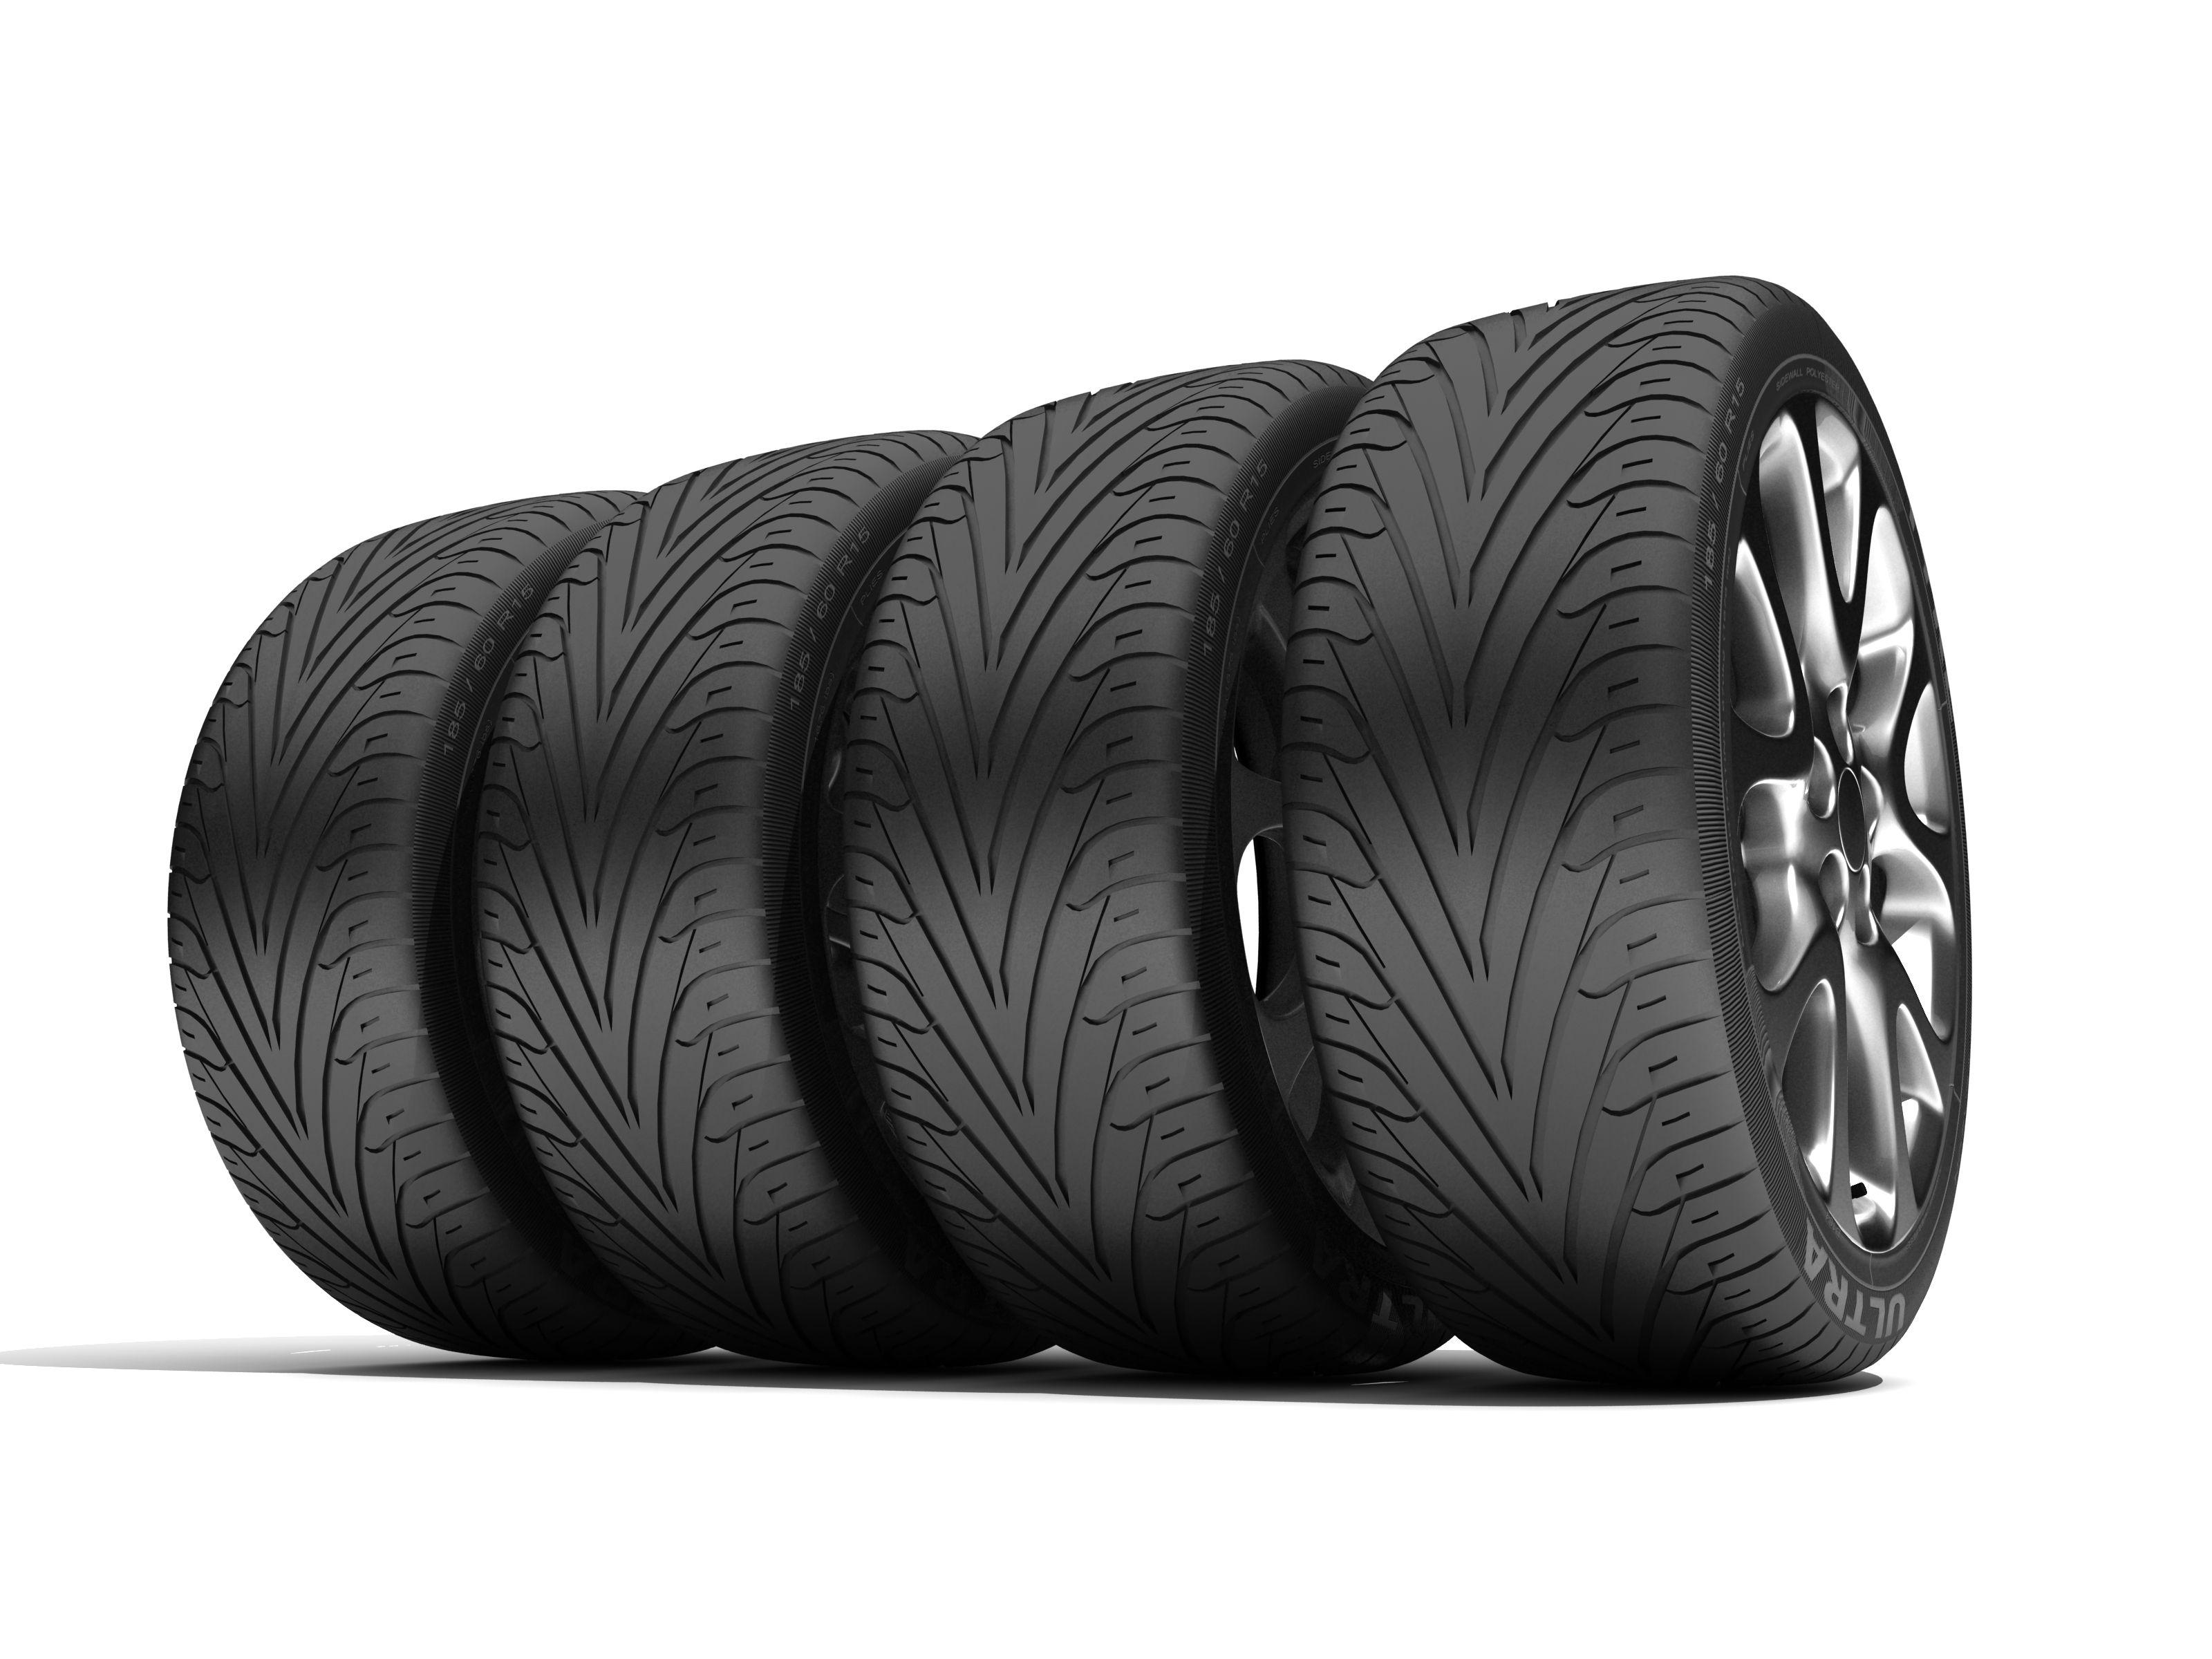 tire Google 搜尋 Mini trucks, Wheels and tires, Compact cars